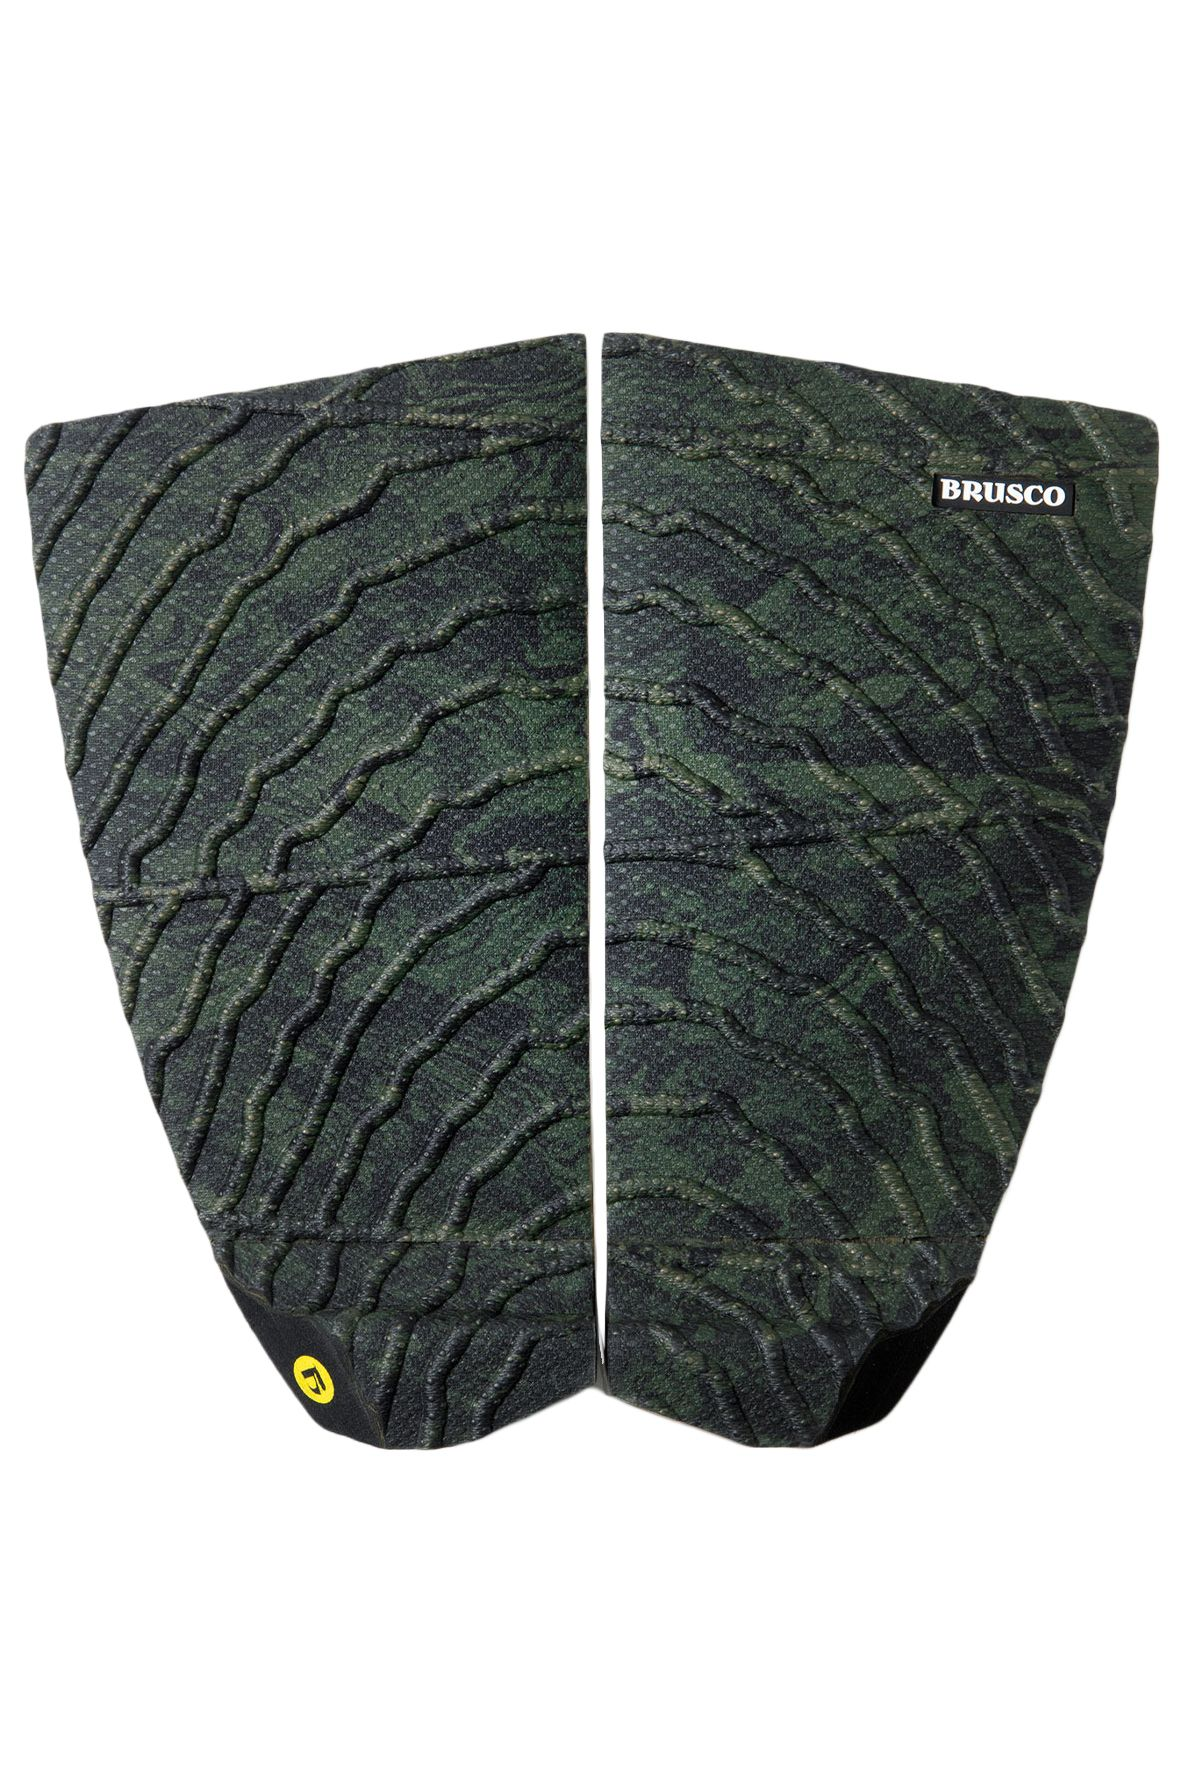 Deck Brusco TAILPAD RUGGED GRIP SEAWEED 2PCS Green/Black